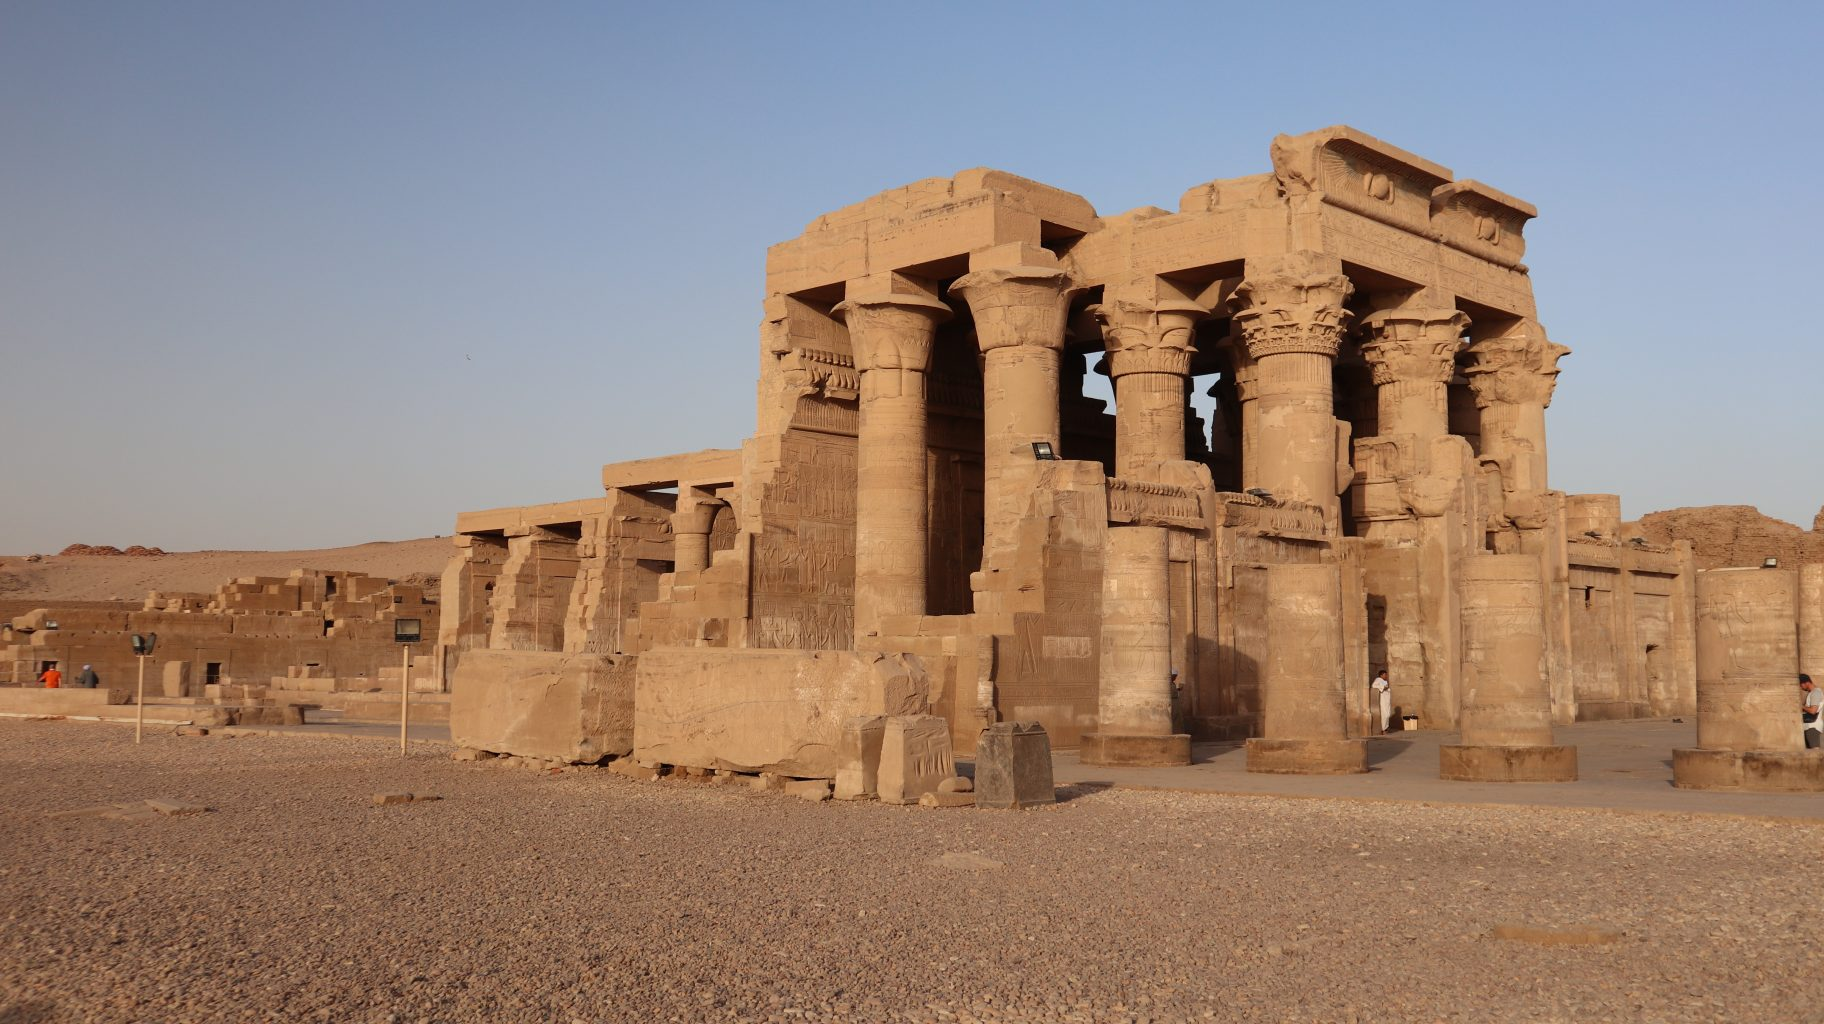 Templo de Kom Ombo. Templo funerario de Hatshepsut